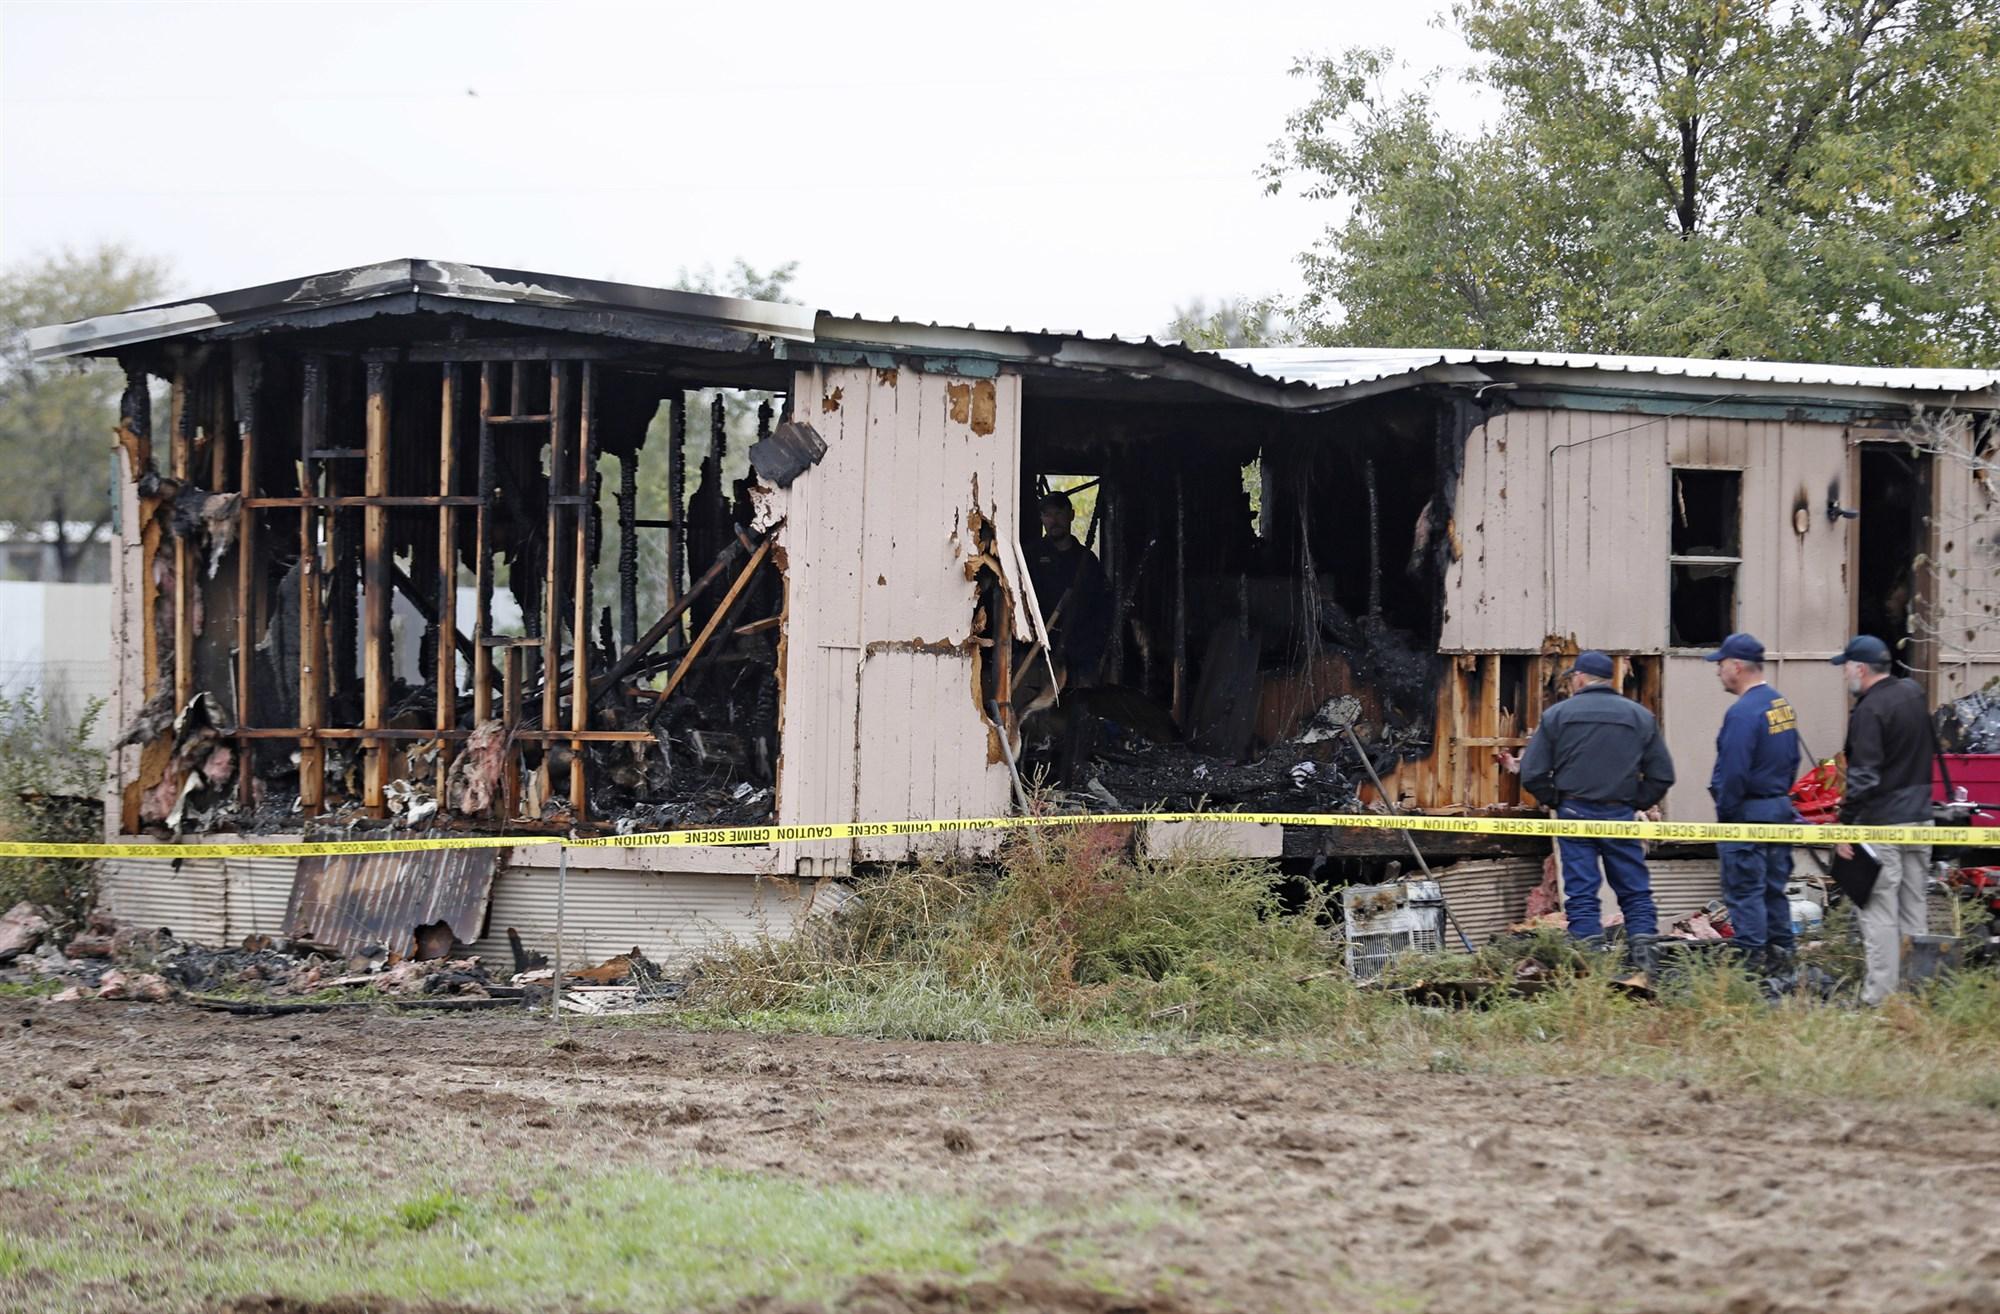 181108-lubbock-texas-fire-children-dead-cs-357p_e9185a25f2228dc1c37ef86107fc4517.fit-2000w_1541716937566.jpg